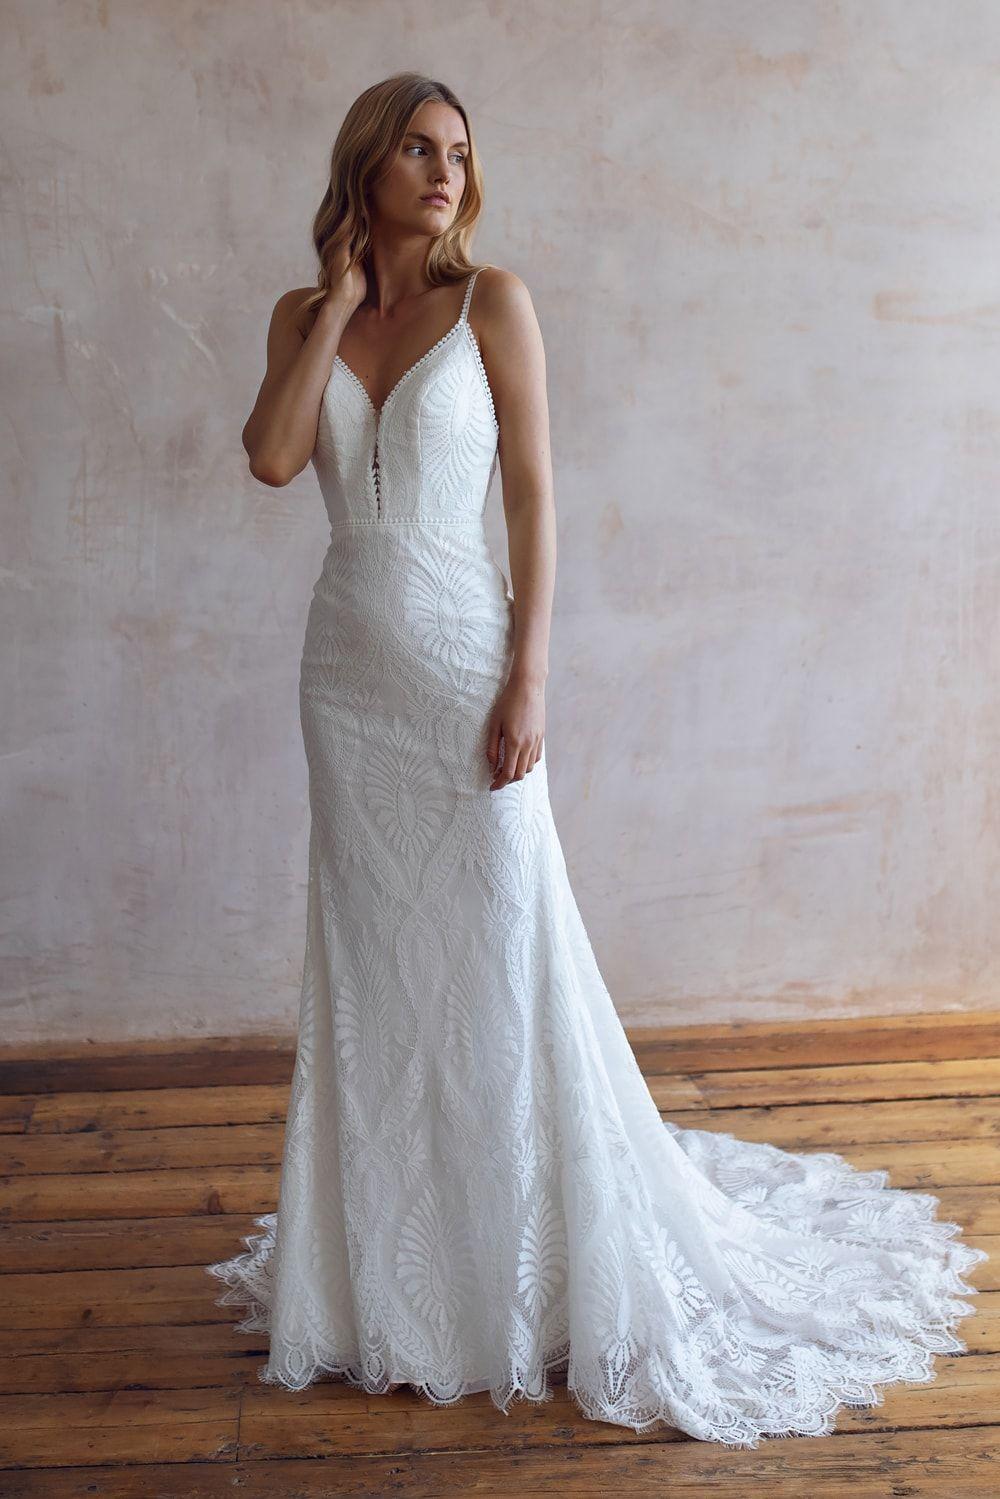 Wedding Dresses Lace Wedding Dresses Long Sleeve Boho Wedding Dresses Wedding Dress Beach Mermaid Wedding Dresses Alterna 25